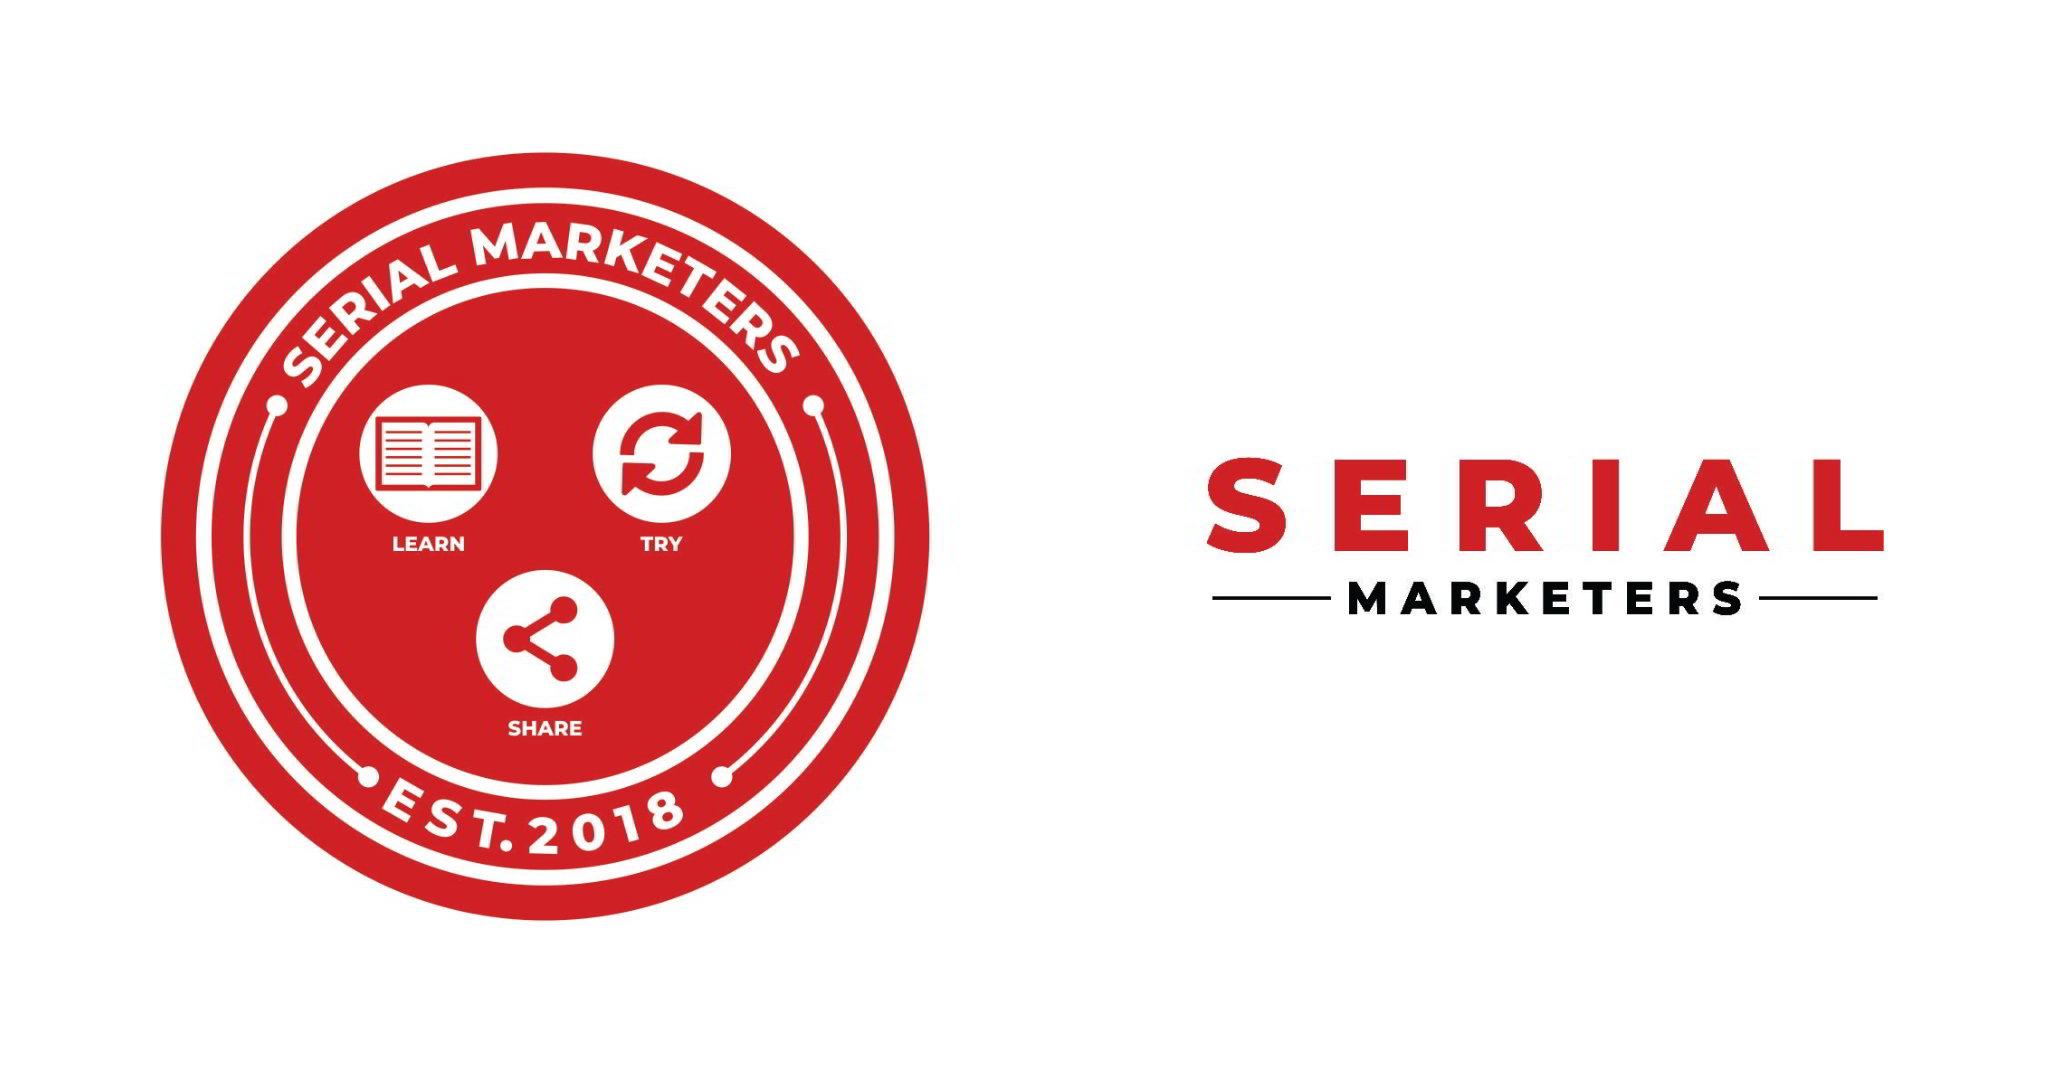 Serial Marketers